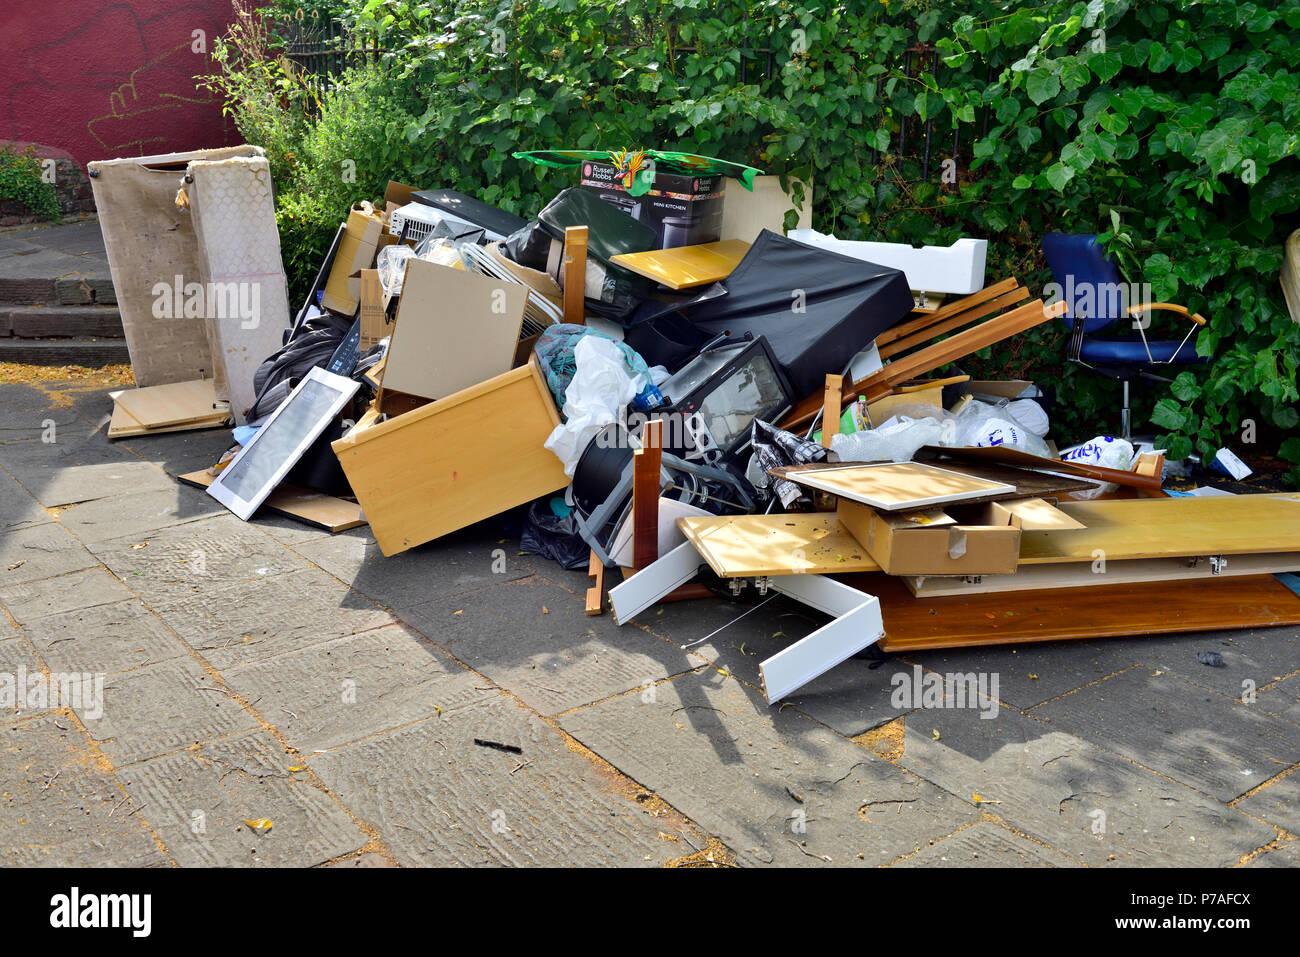 Bristol, UK. 5th July 2018. Rubbish piled and left on public footpath, Bristol, UK Credit: Charles Stirling/Alamy Live News - Stock Image